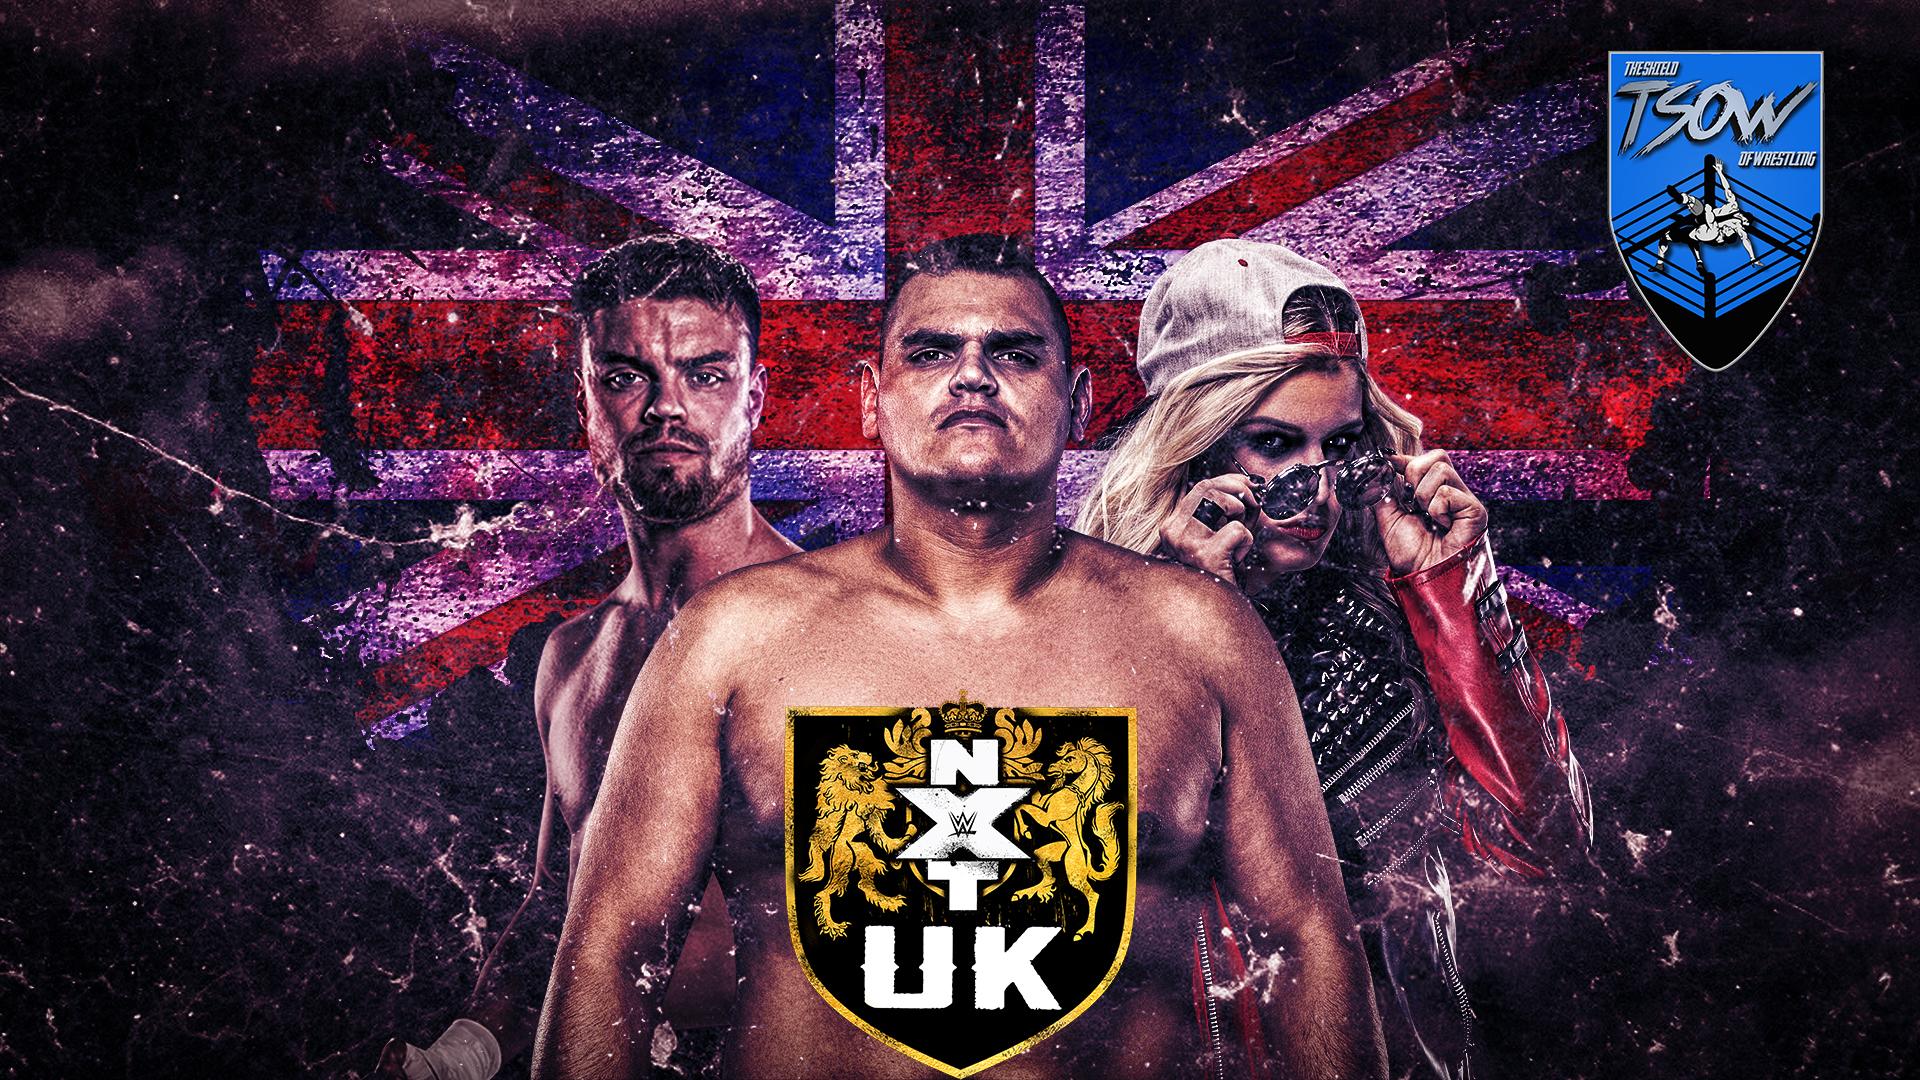 NXT UK 18-09-2019 Report- NXT UK